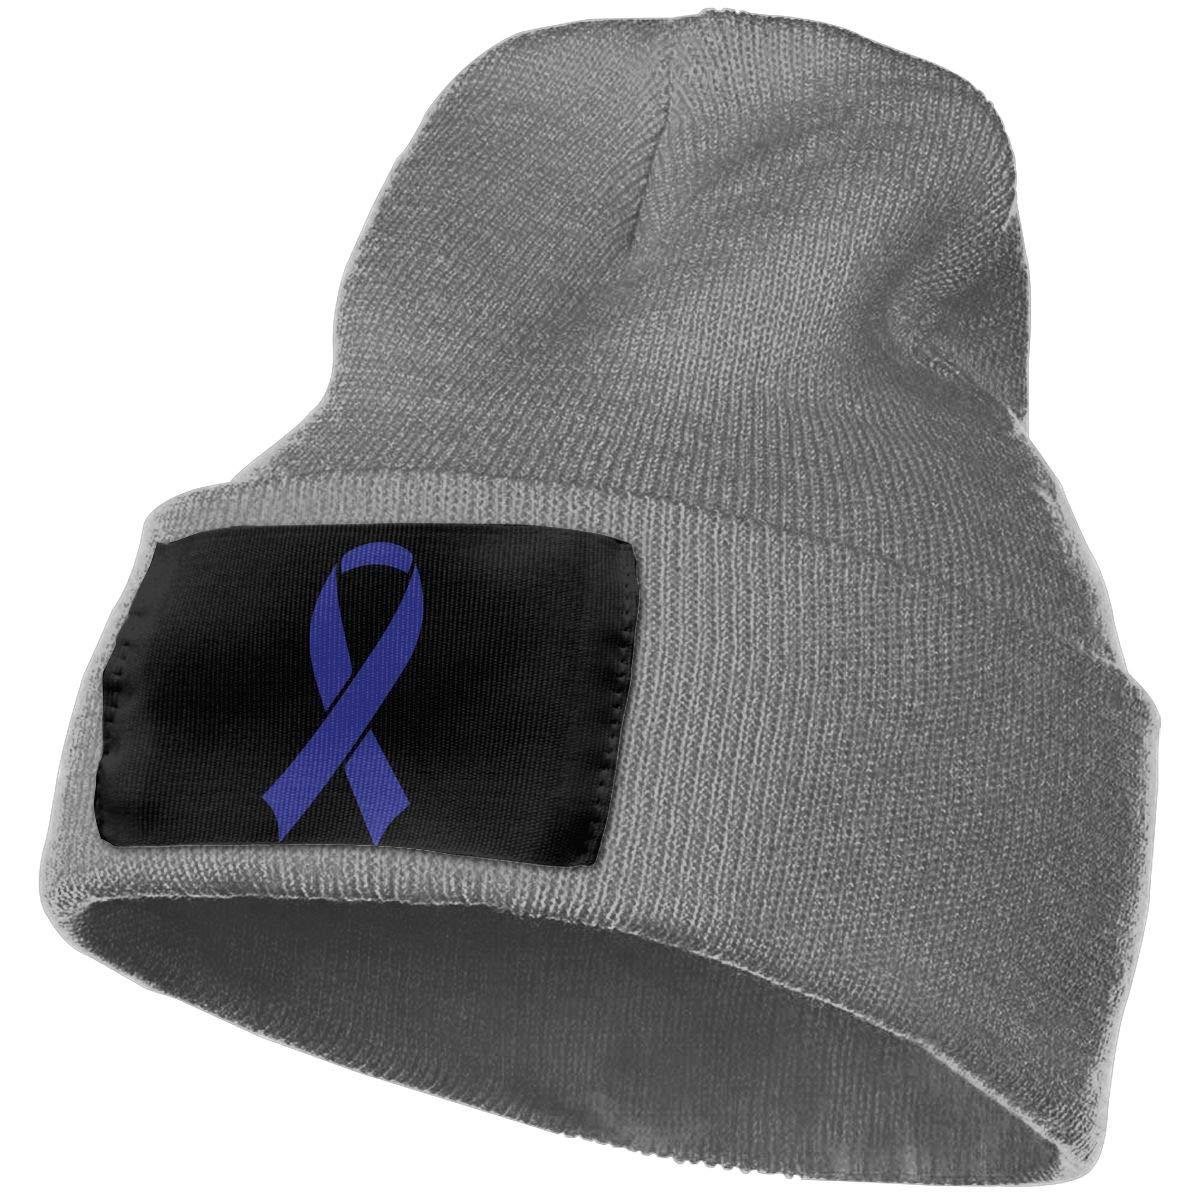 Colon Cancer Awareness Ribbon Men /& Women Knit Hats Stretchy /& Soft Ski Cap Beanie